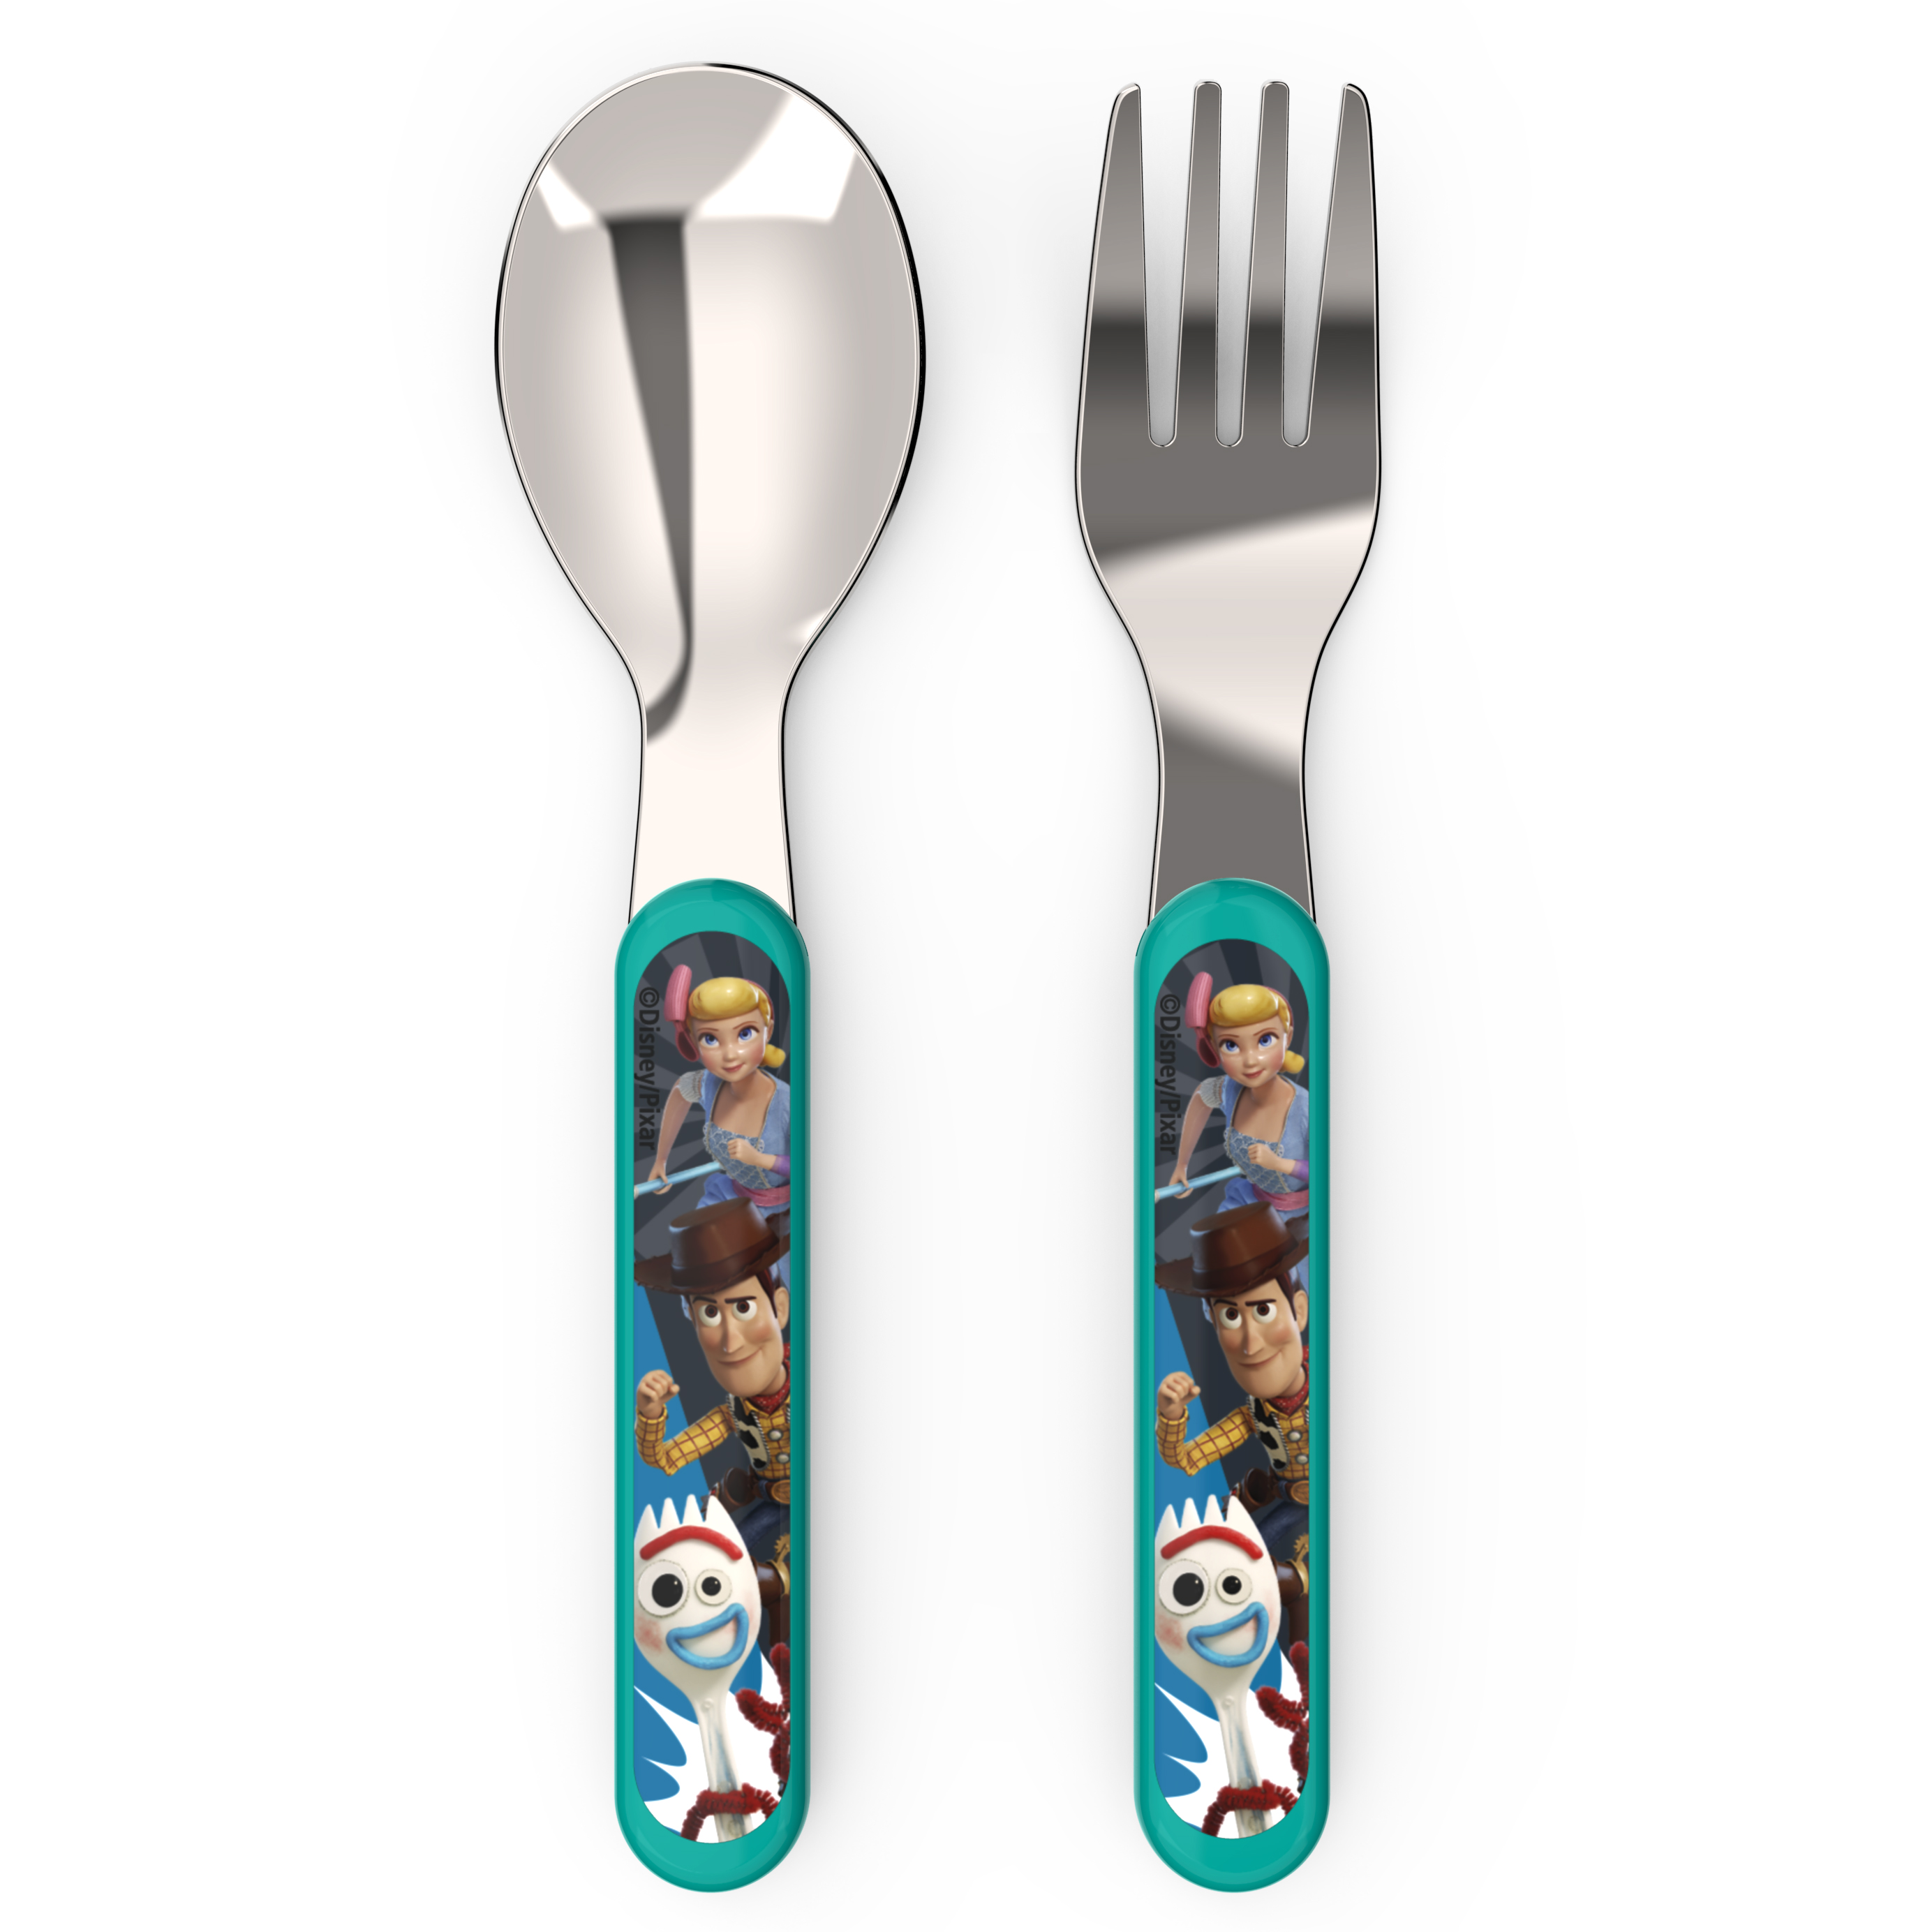 Disney Pixar Dinnerware Set, Toy Story 4, 5-piece set slideshow image 6